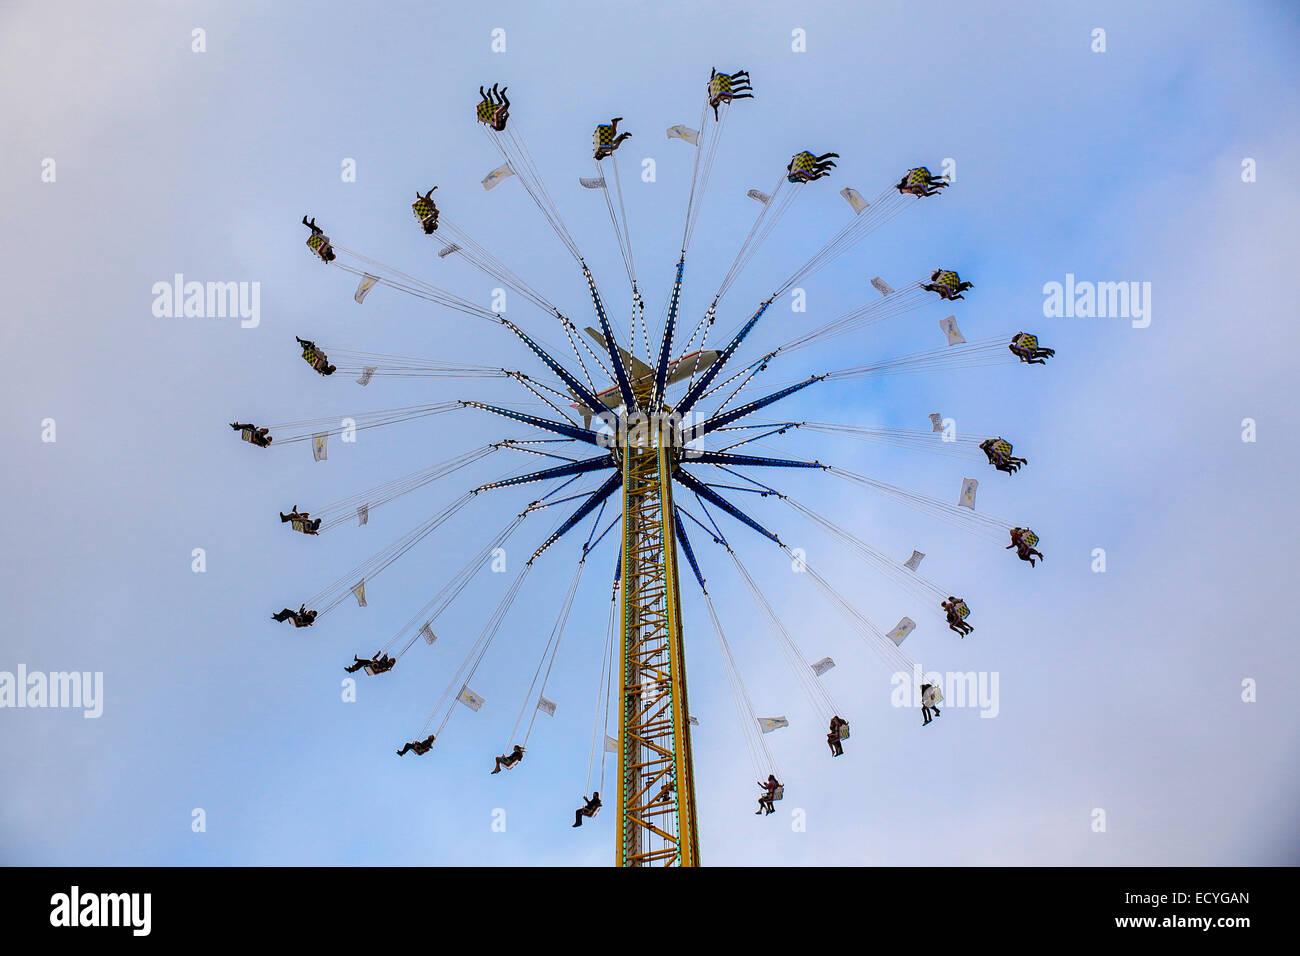 amusement park swing thrill ride scary blue sky - Stock Image